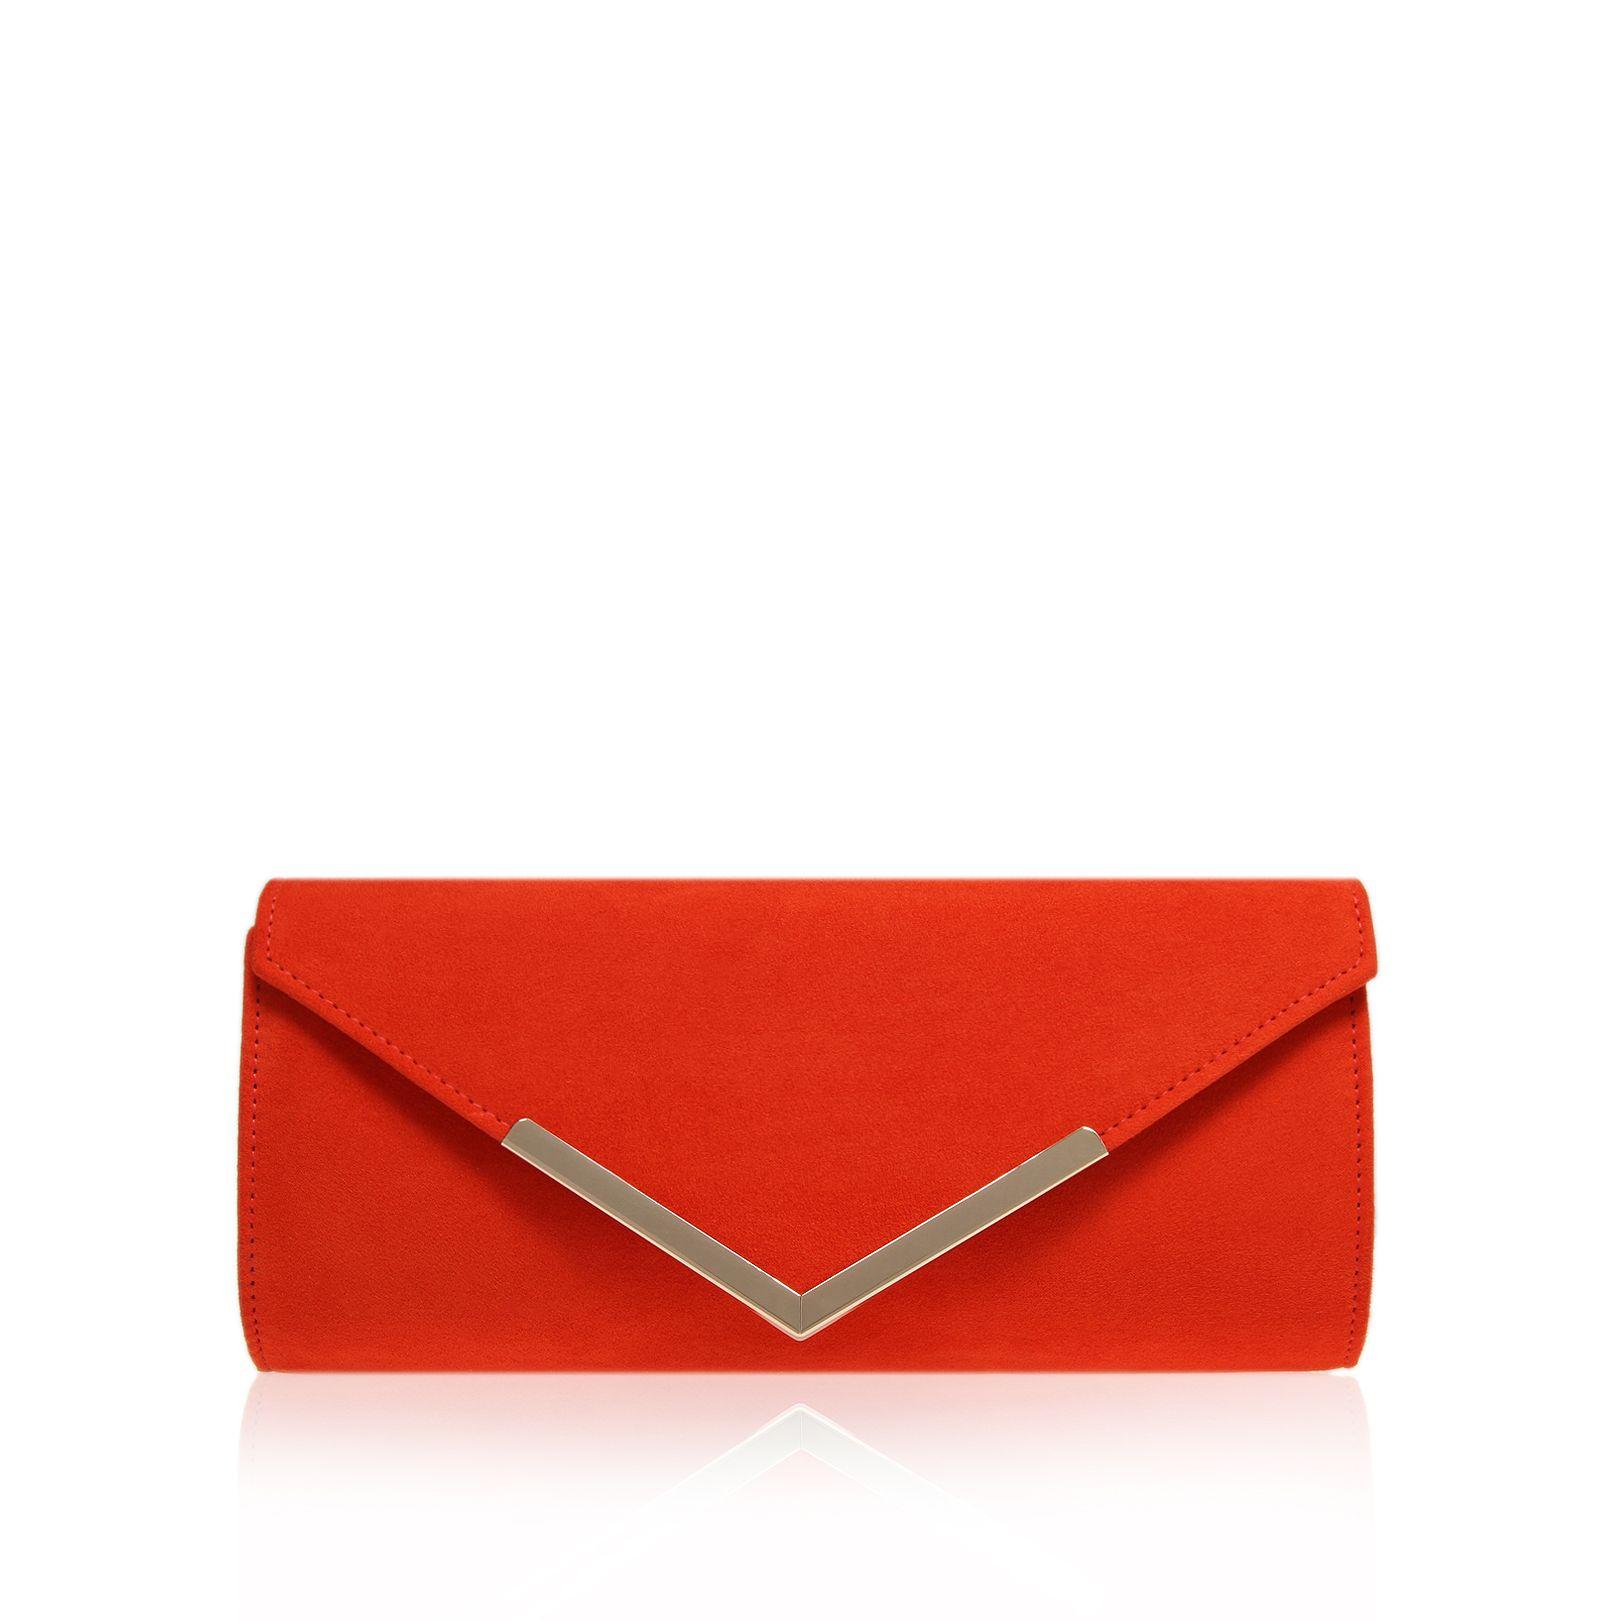 Carvela kurt geiger Daphne Clutch Evening Bag in Red : Lyst